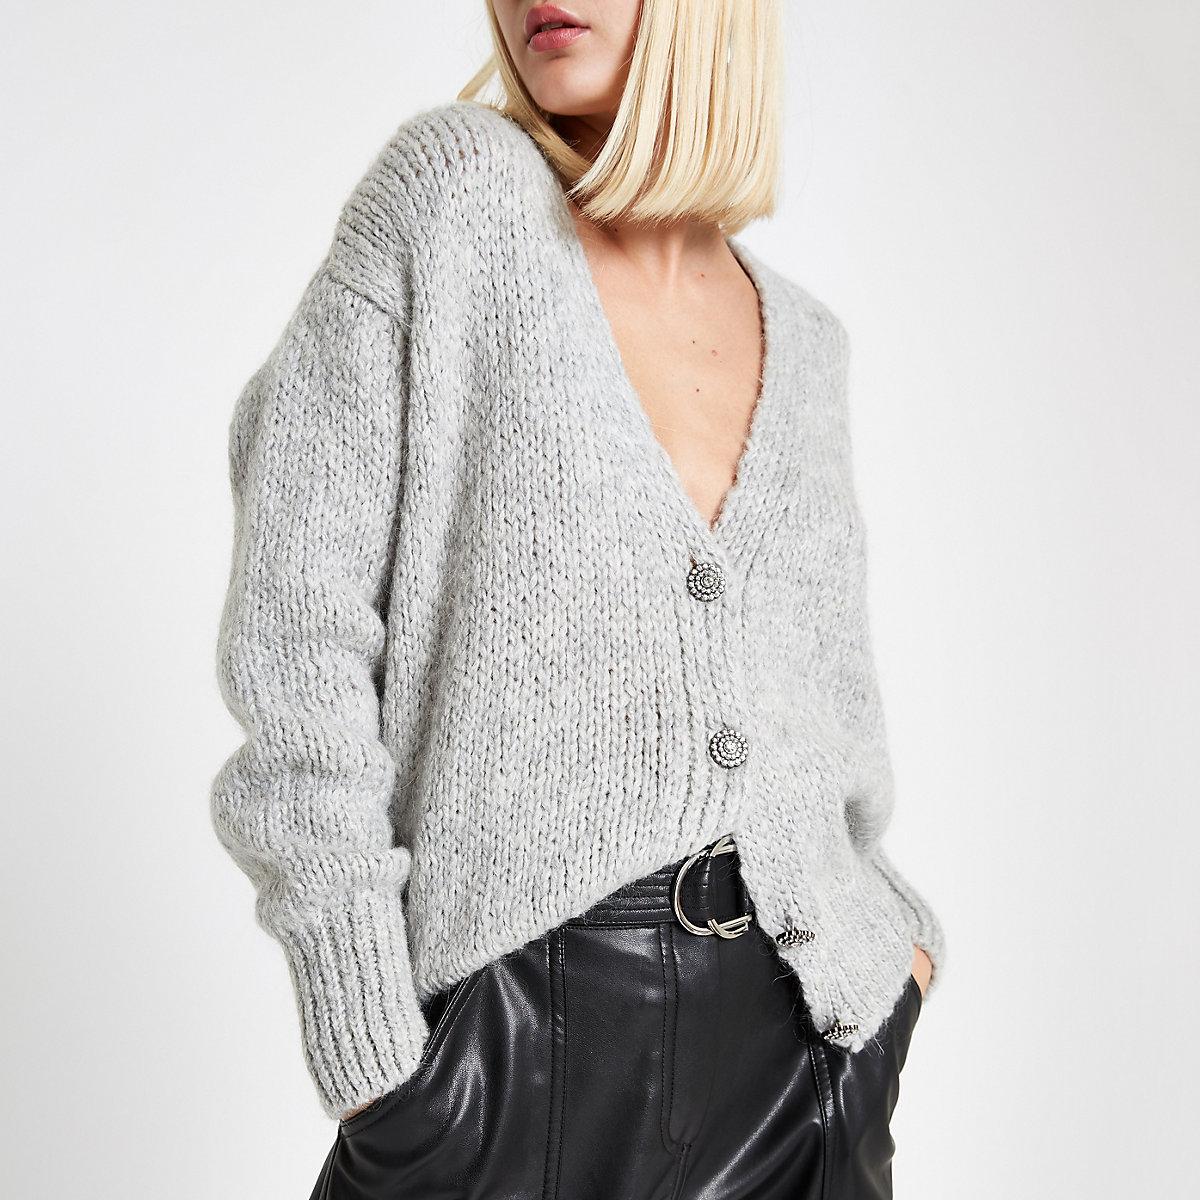 Grey diamante button knit cardigan